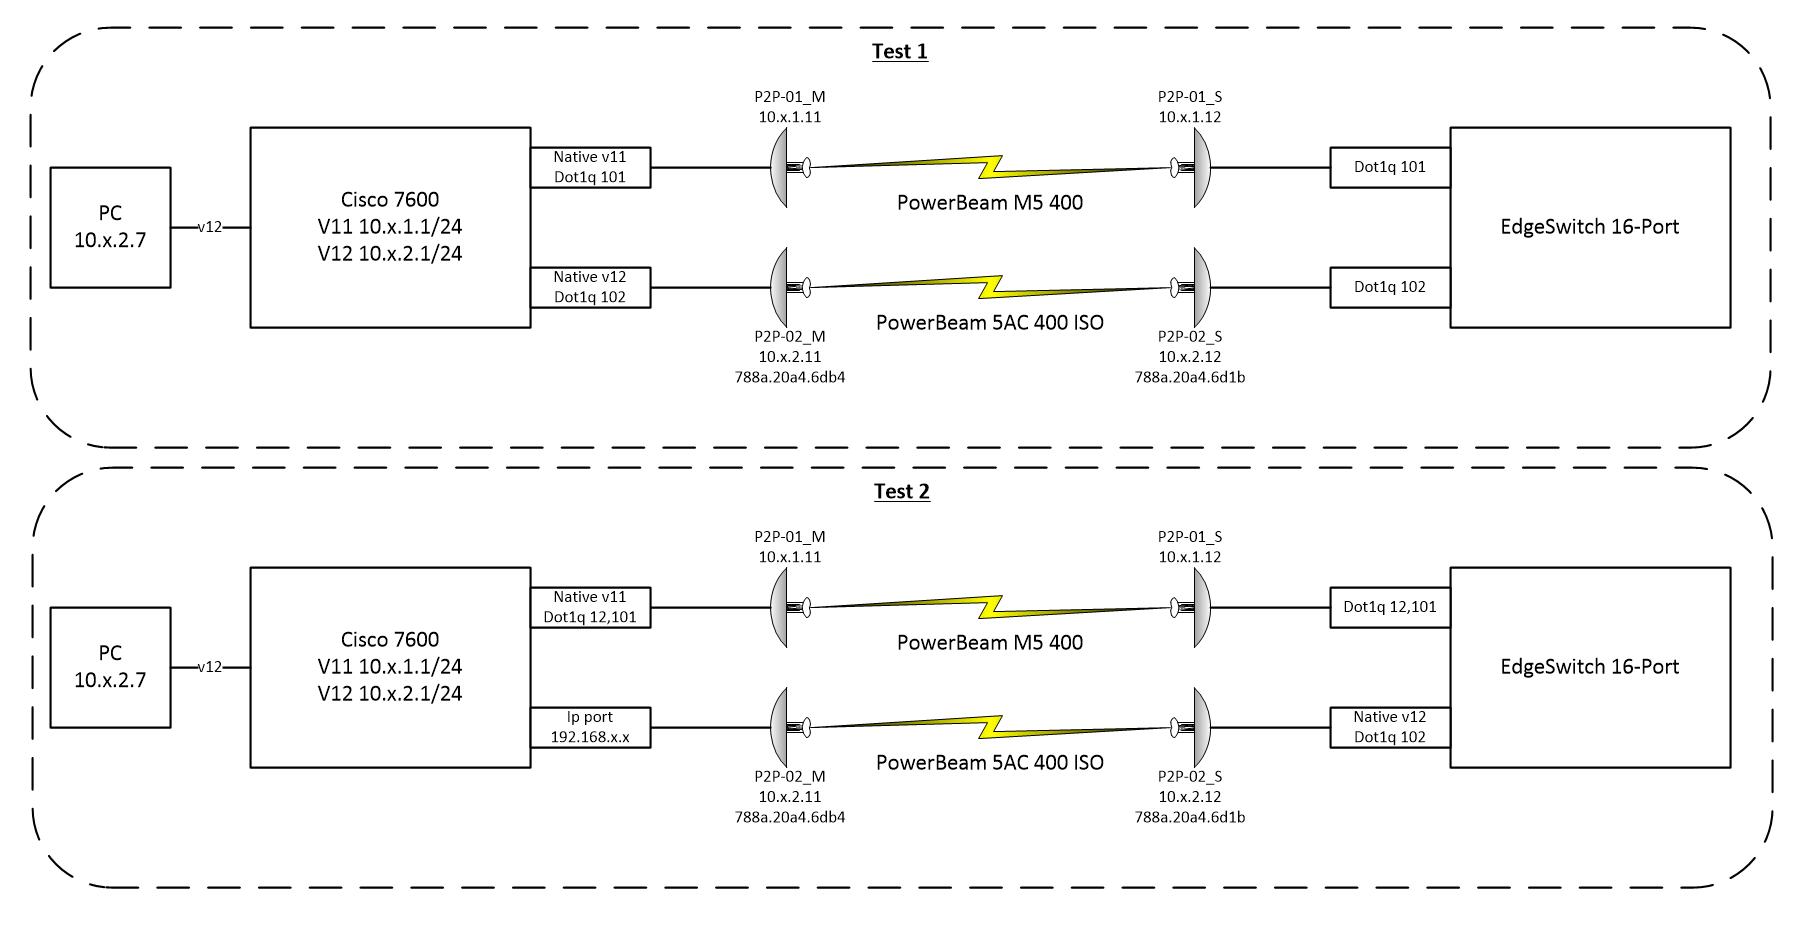 Weird MAC problem with PowerBeam 5AC 400 ISO | Ubiquiti